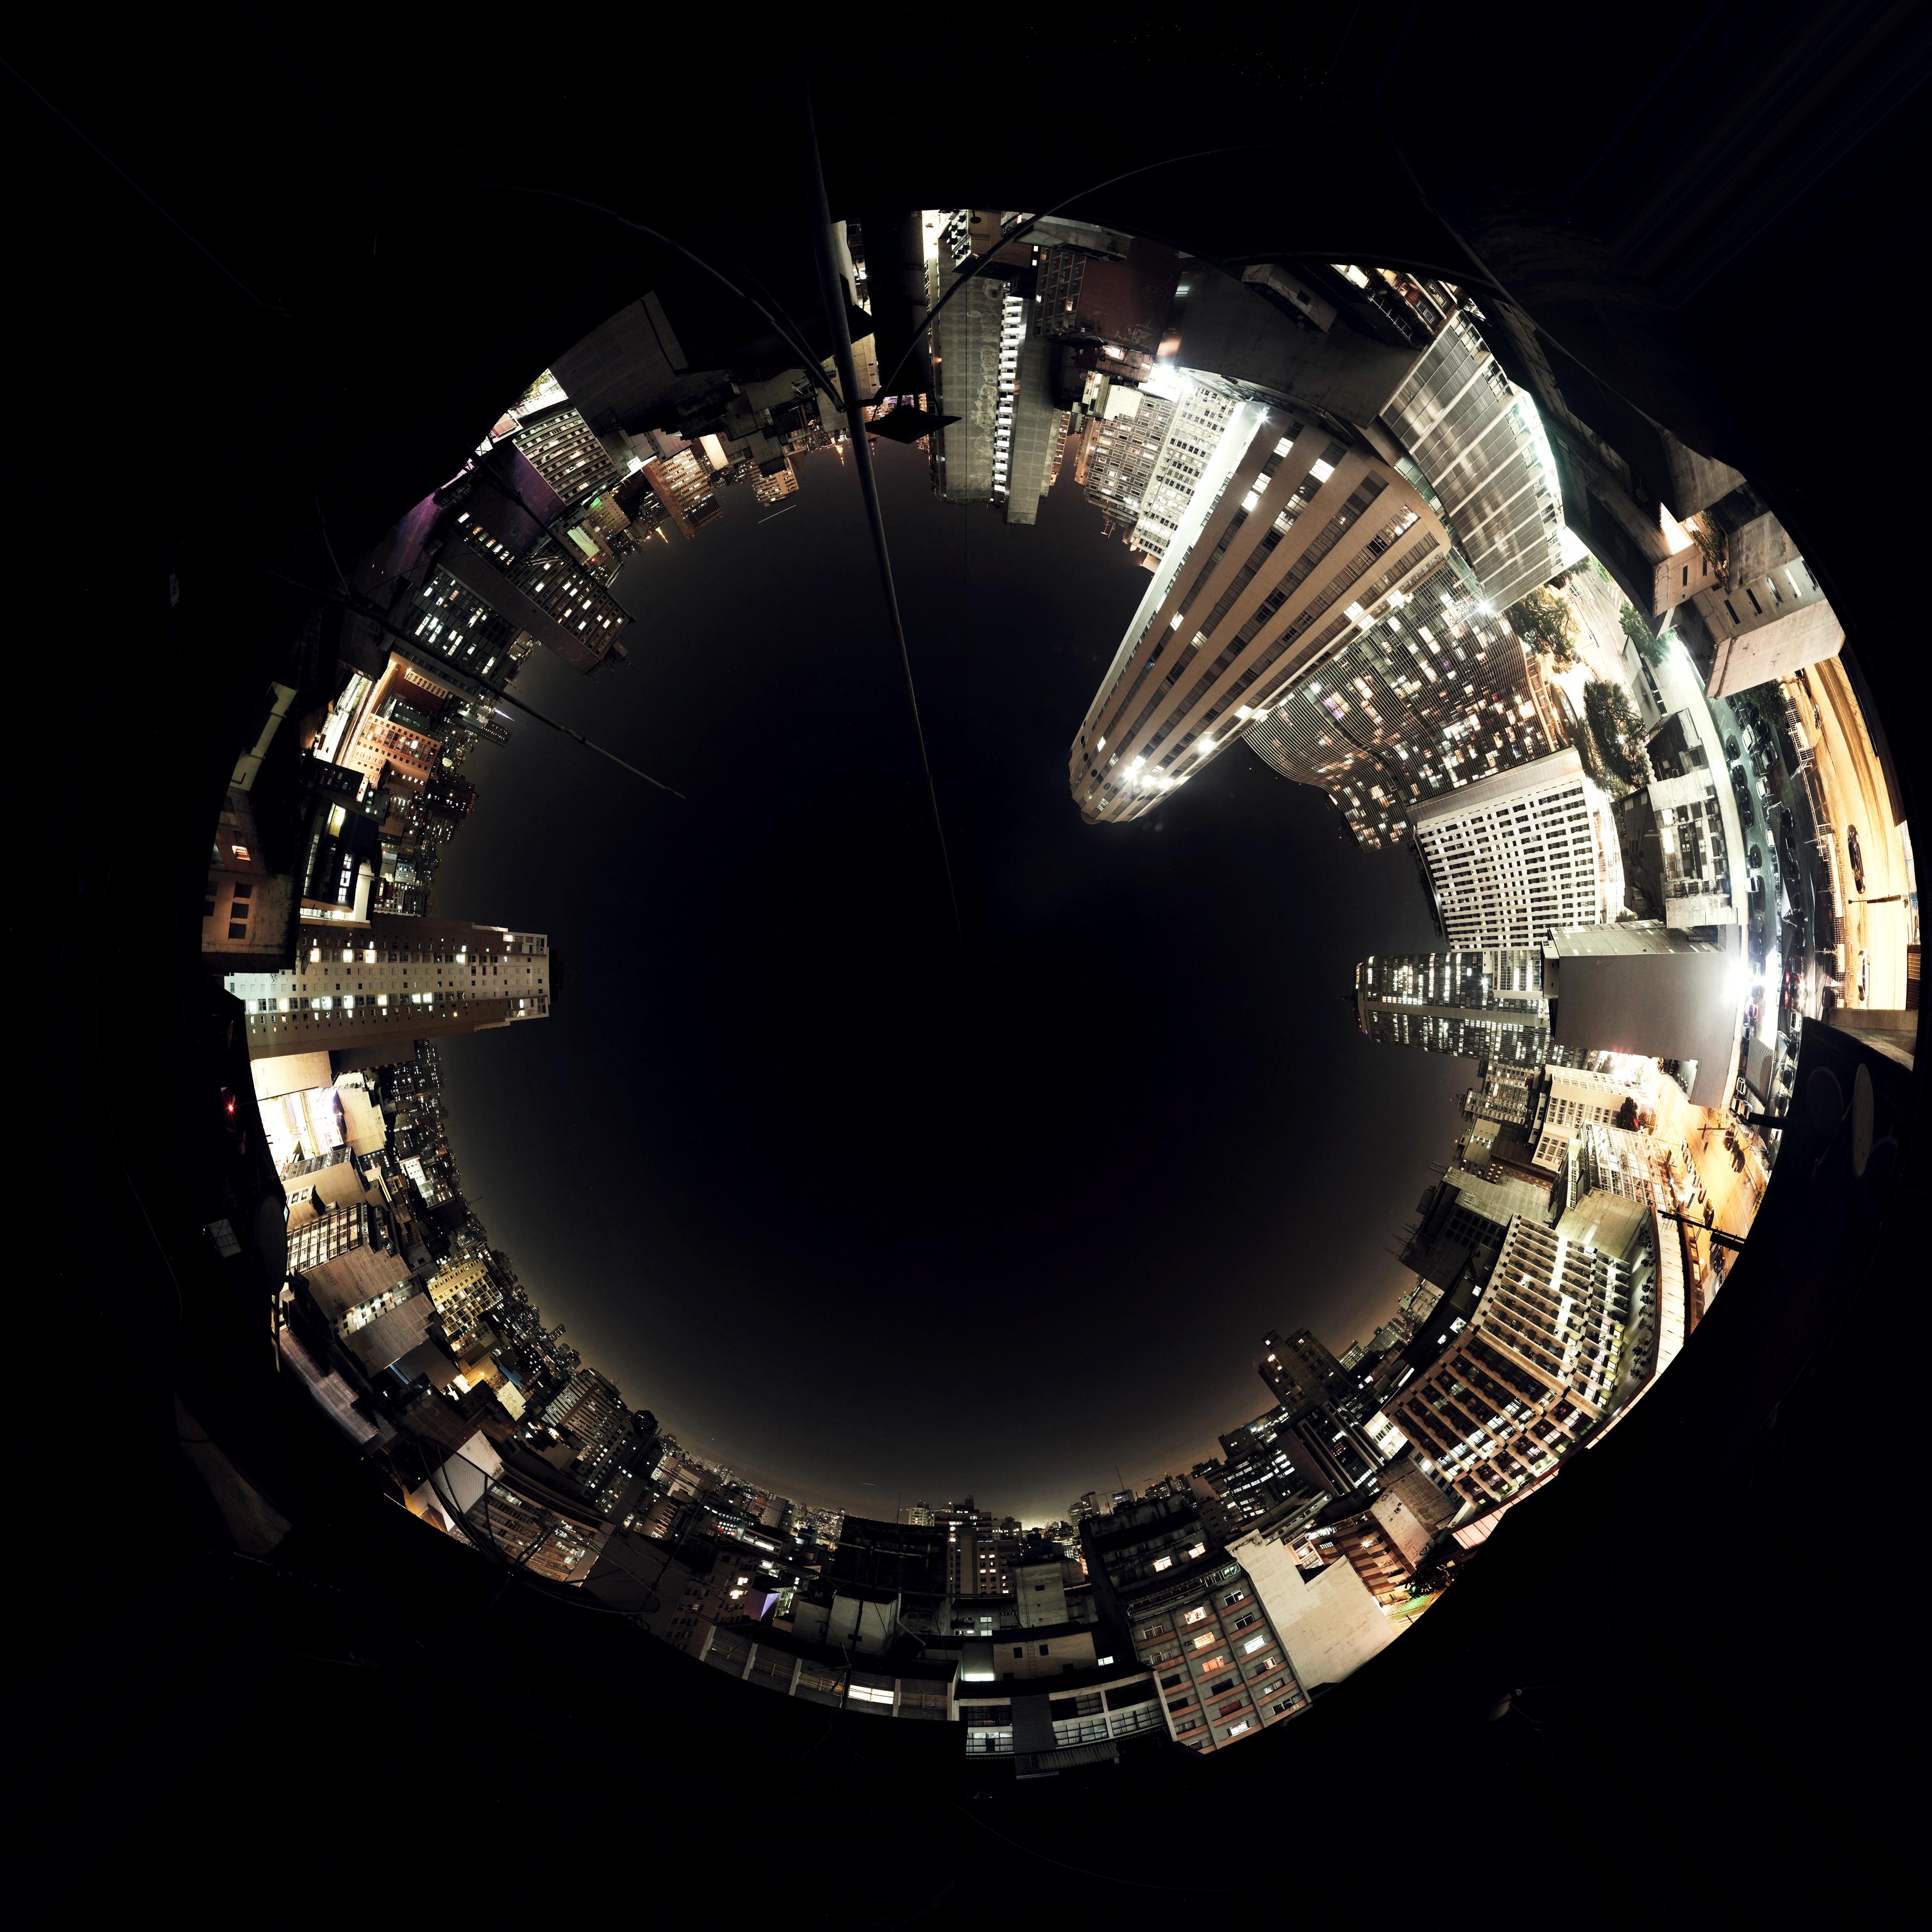 sp noite predio planeta concavo 150 filt